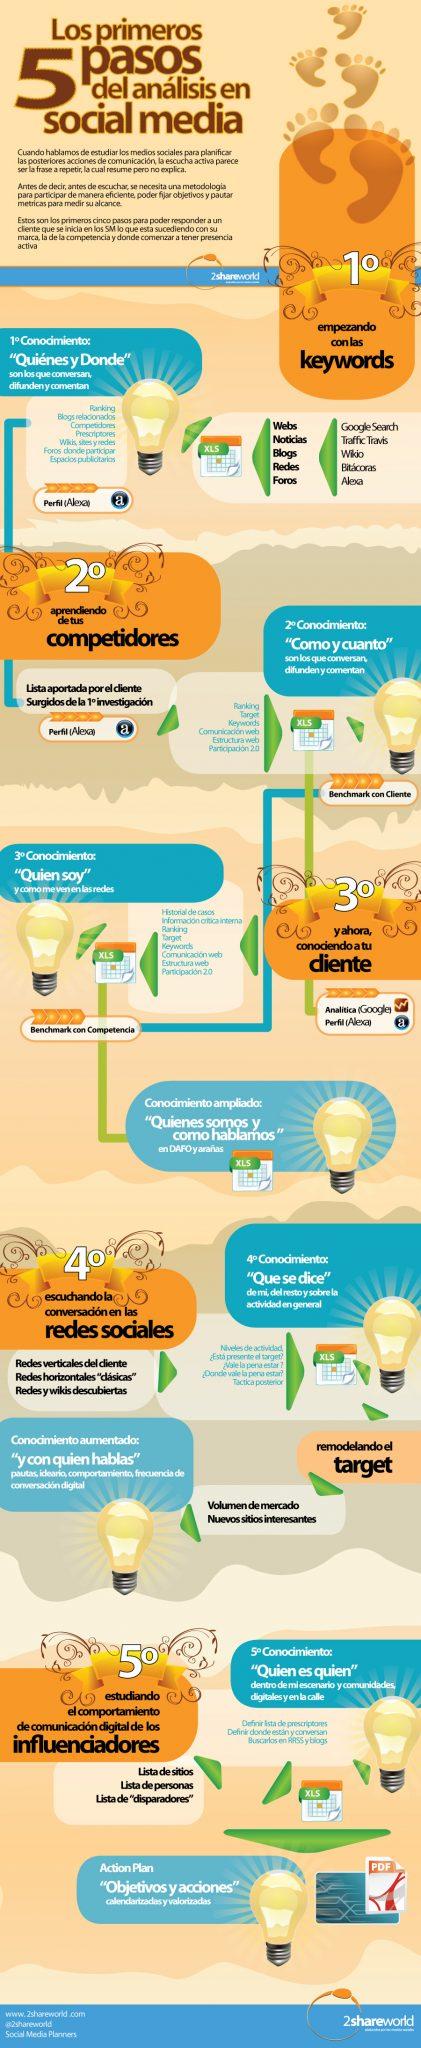 5 pasos analisis socialmedia